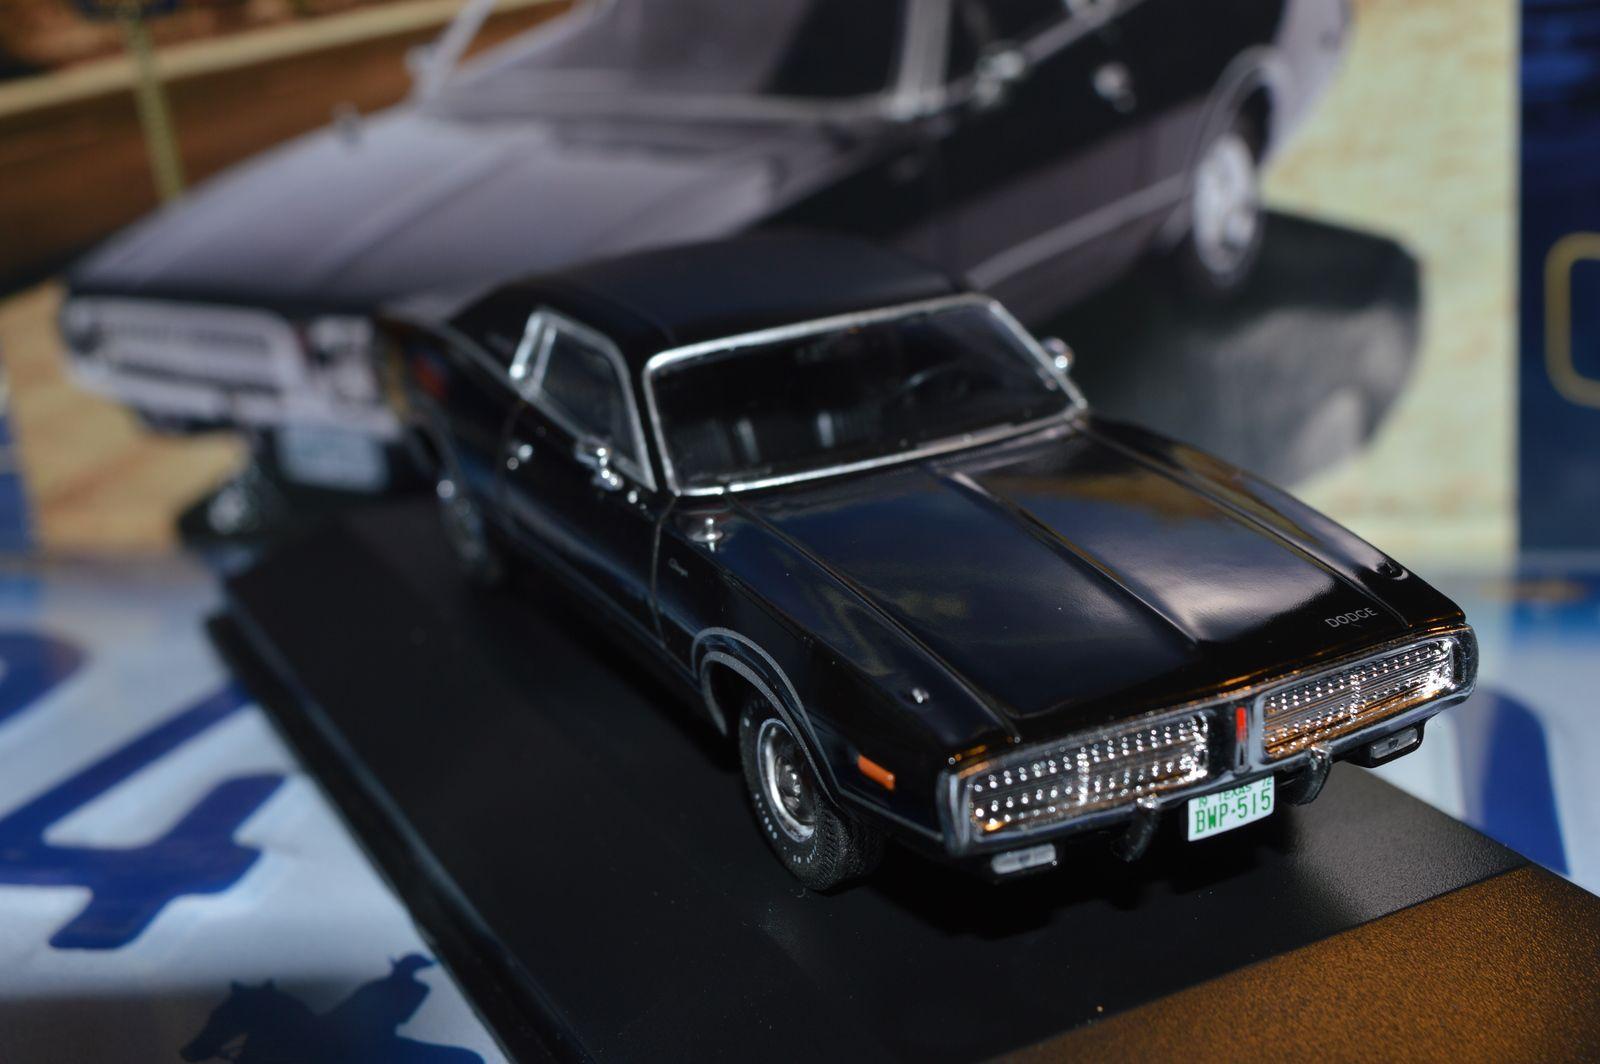 AMERICAN CARS Altaya                        https://bit.ly/VOITURESAM%C3%89RICAINESFR